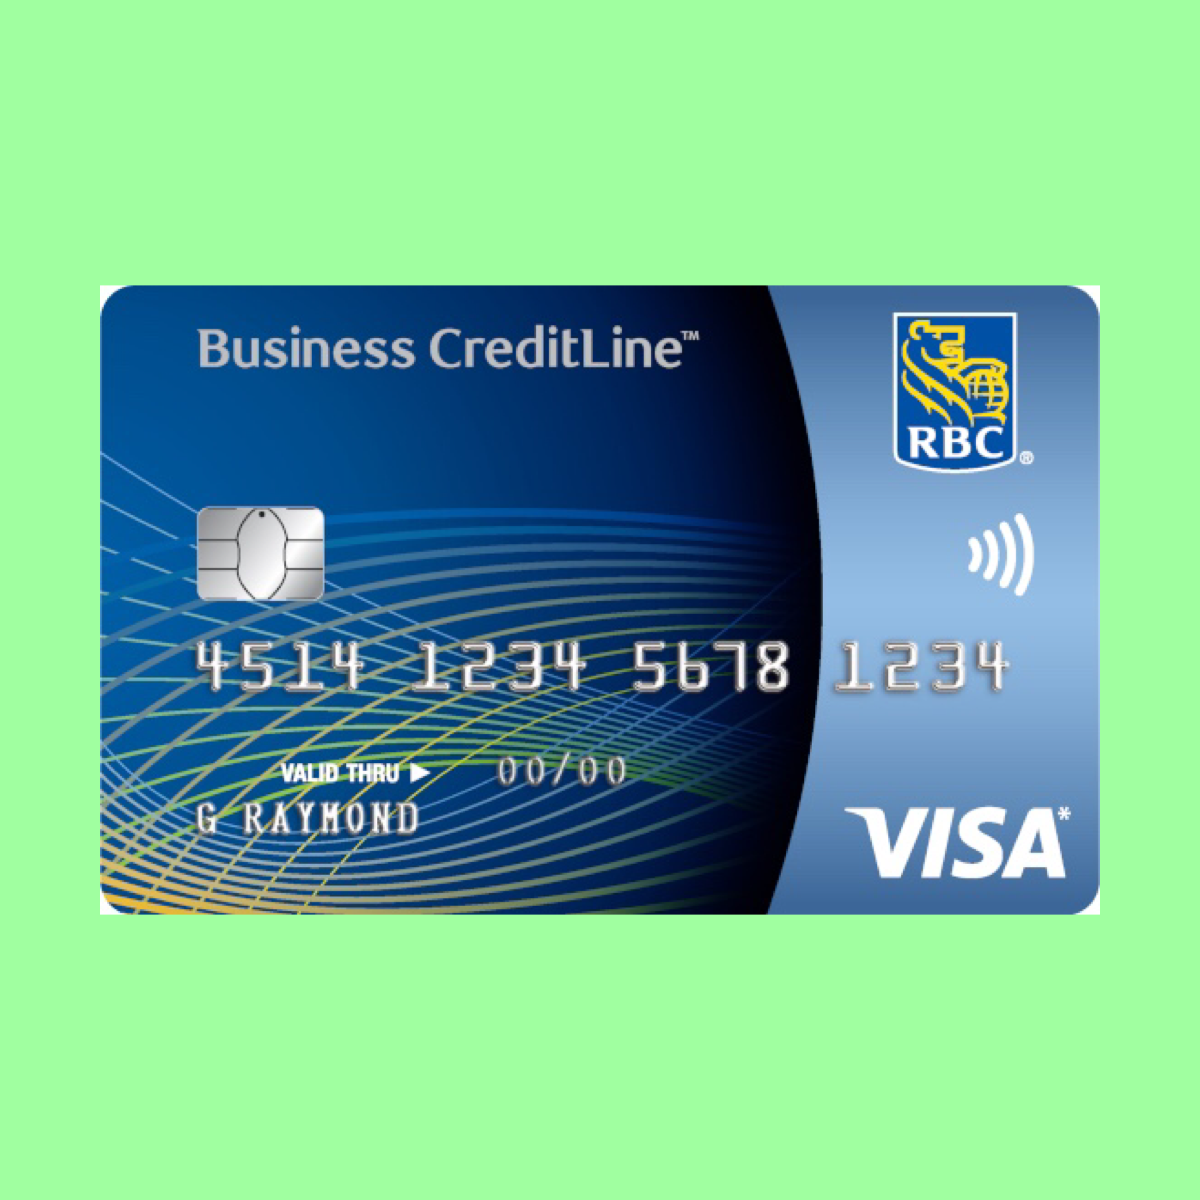 Rbc Visa Creditline Business Card The Point Calculator Small Business Cards Business Reward Card